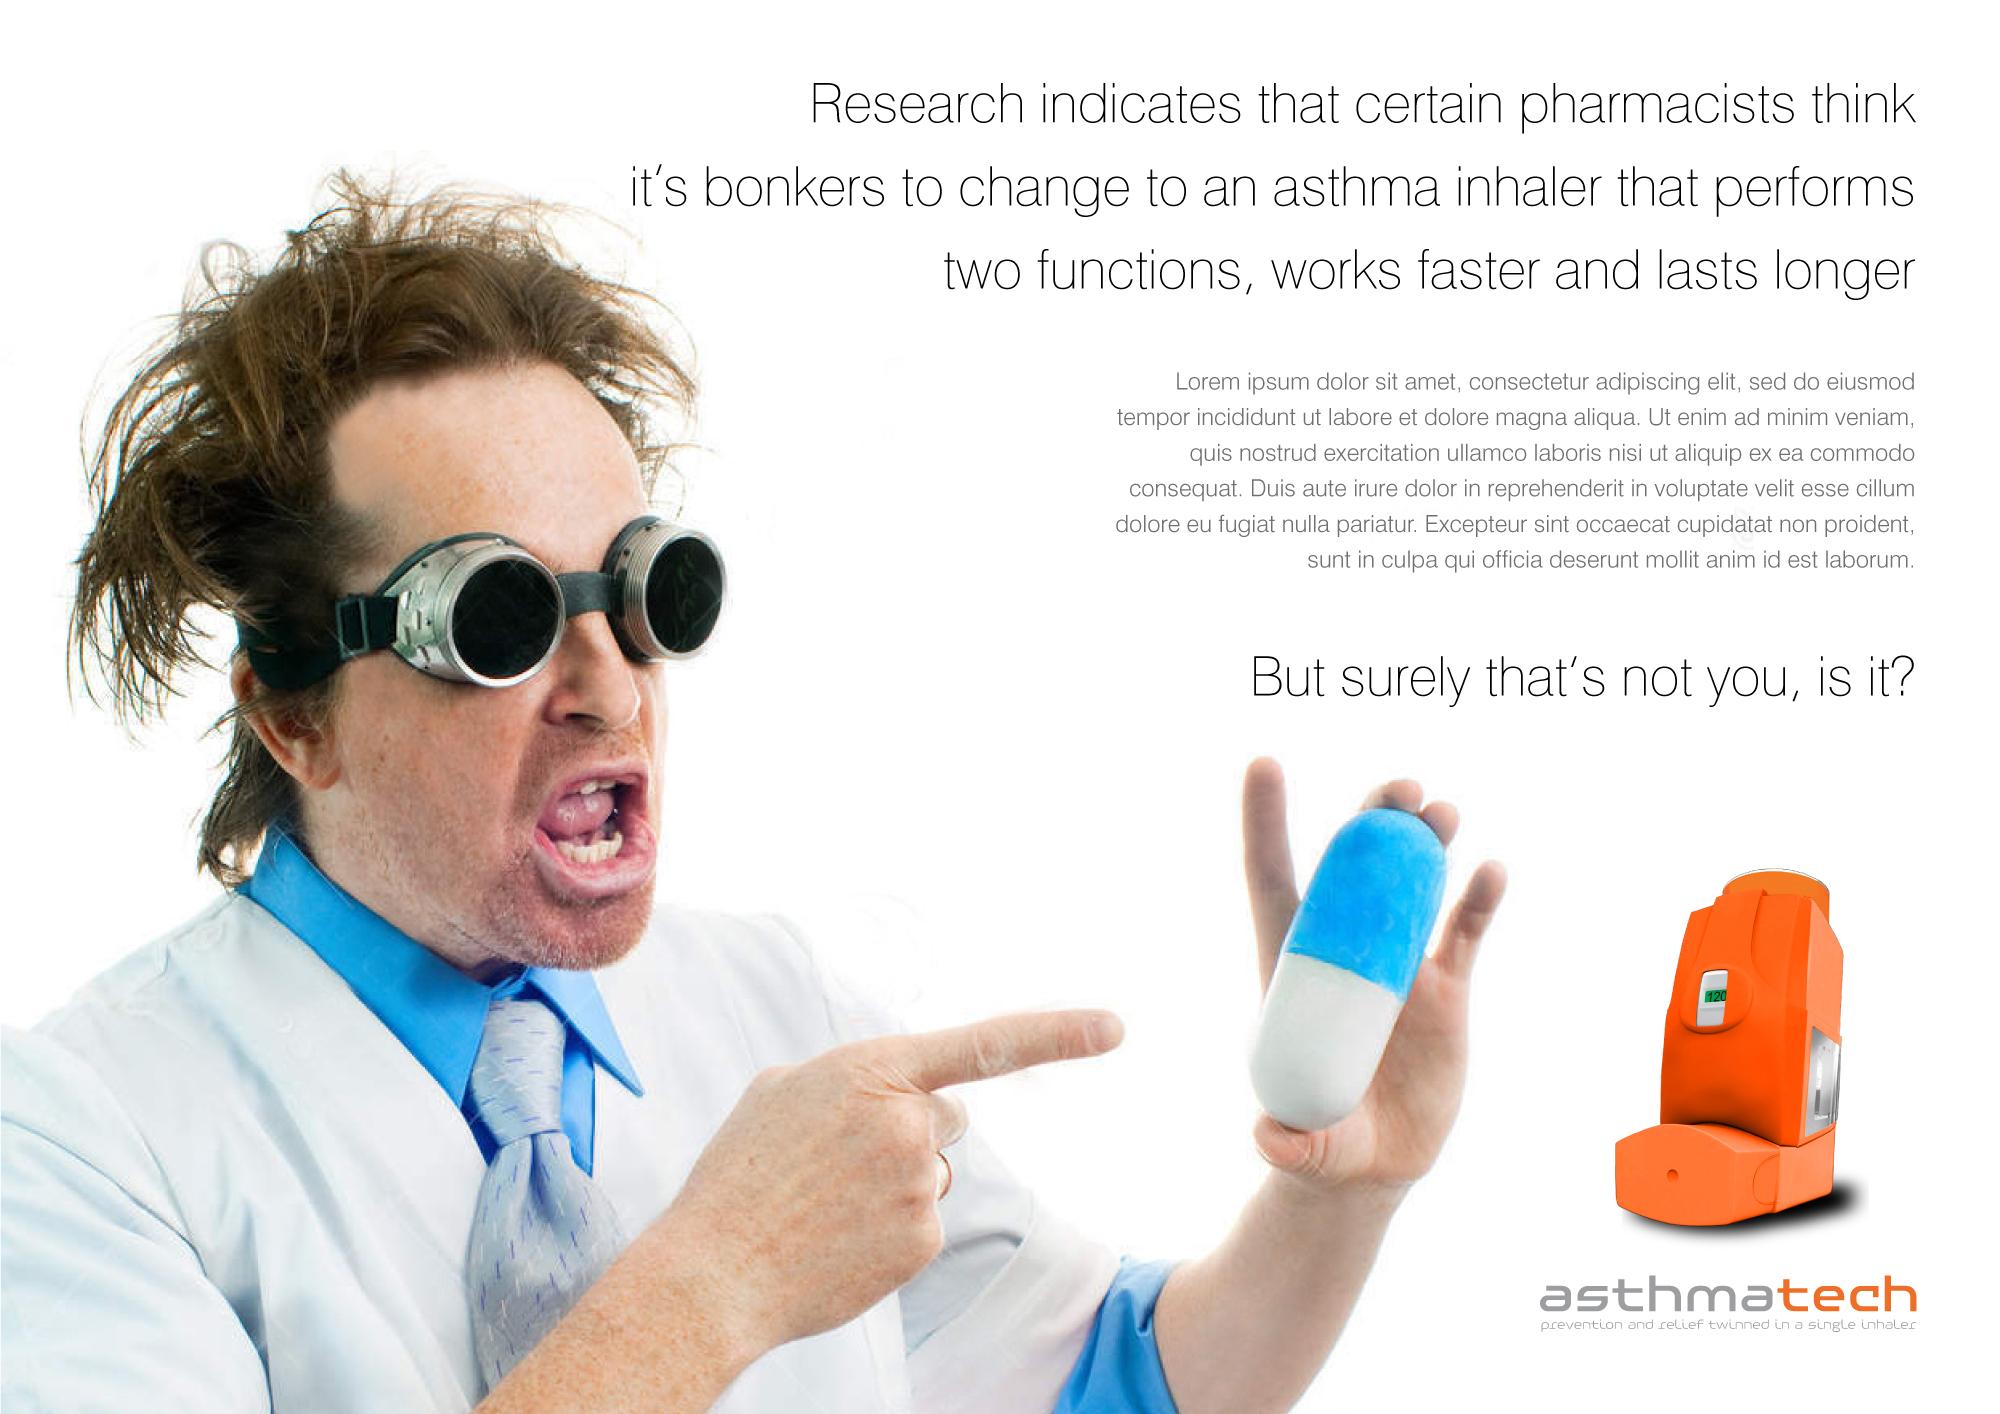 04_crazy_asthmatech_ad_concept